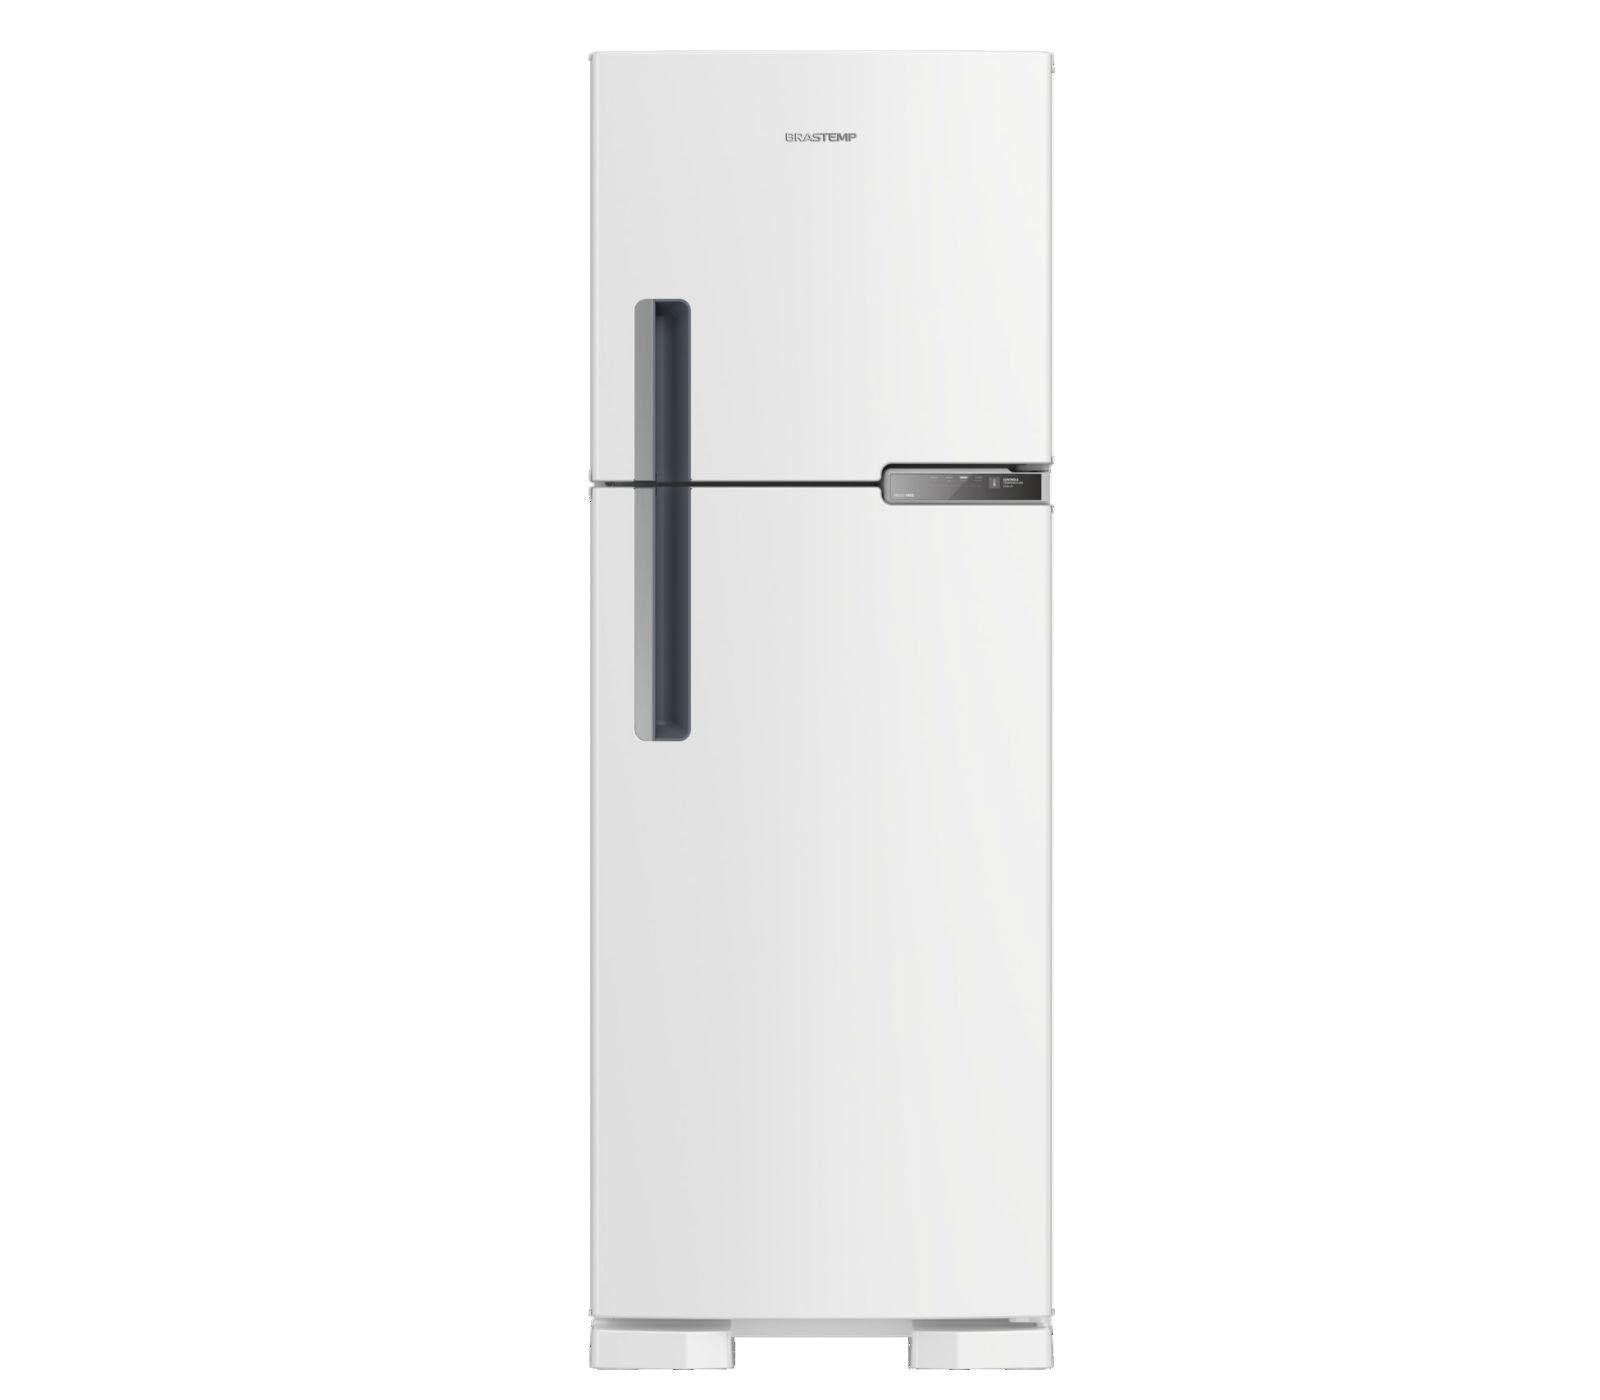 GeladeiraRefrigerador Brastemp Frost Free Duplex 375L Branco 220V - BRM44HBBNA